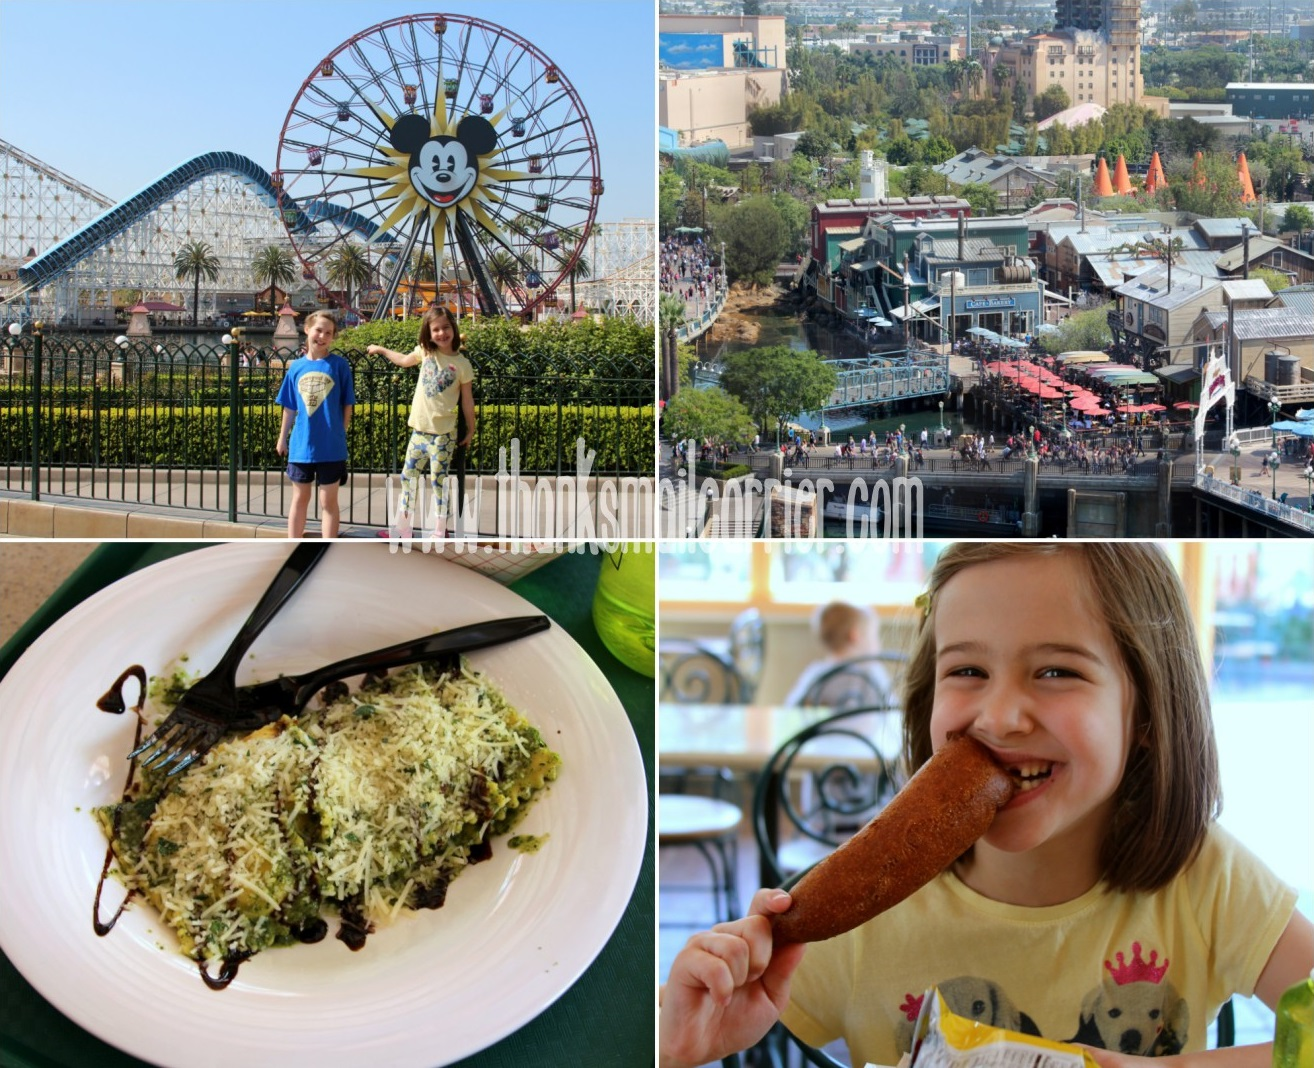 Disneyland Paradise Pier food